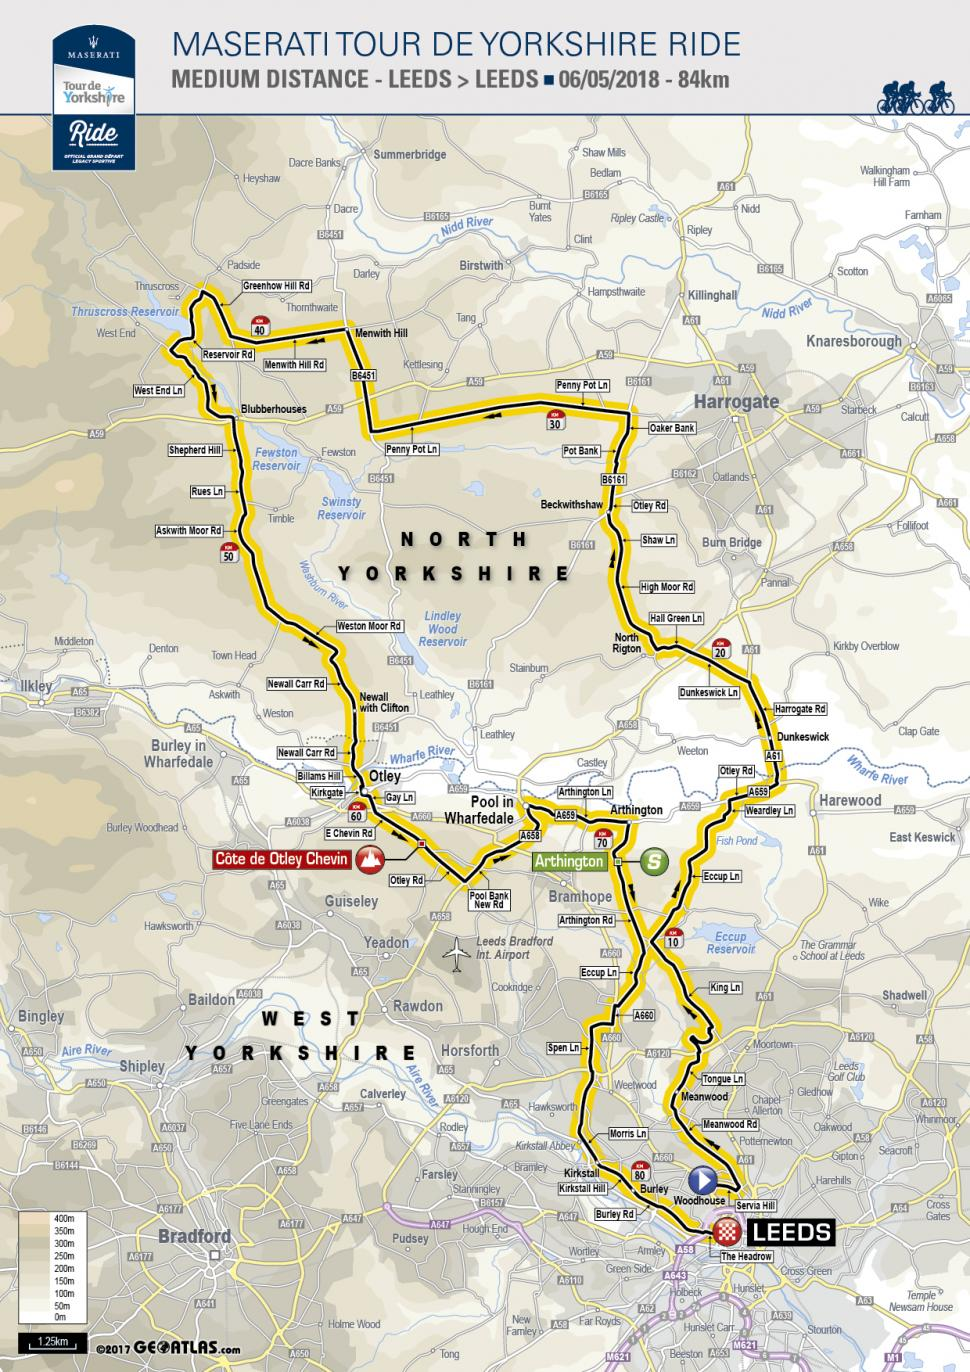 Maserati Tour de Yorkshire Ride 2018 Medium.JPG